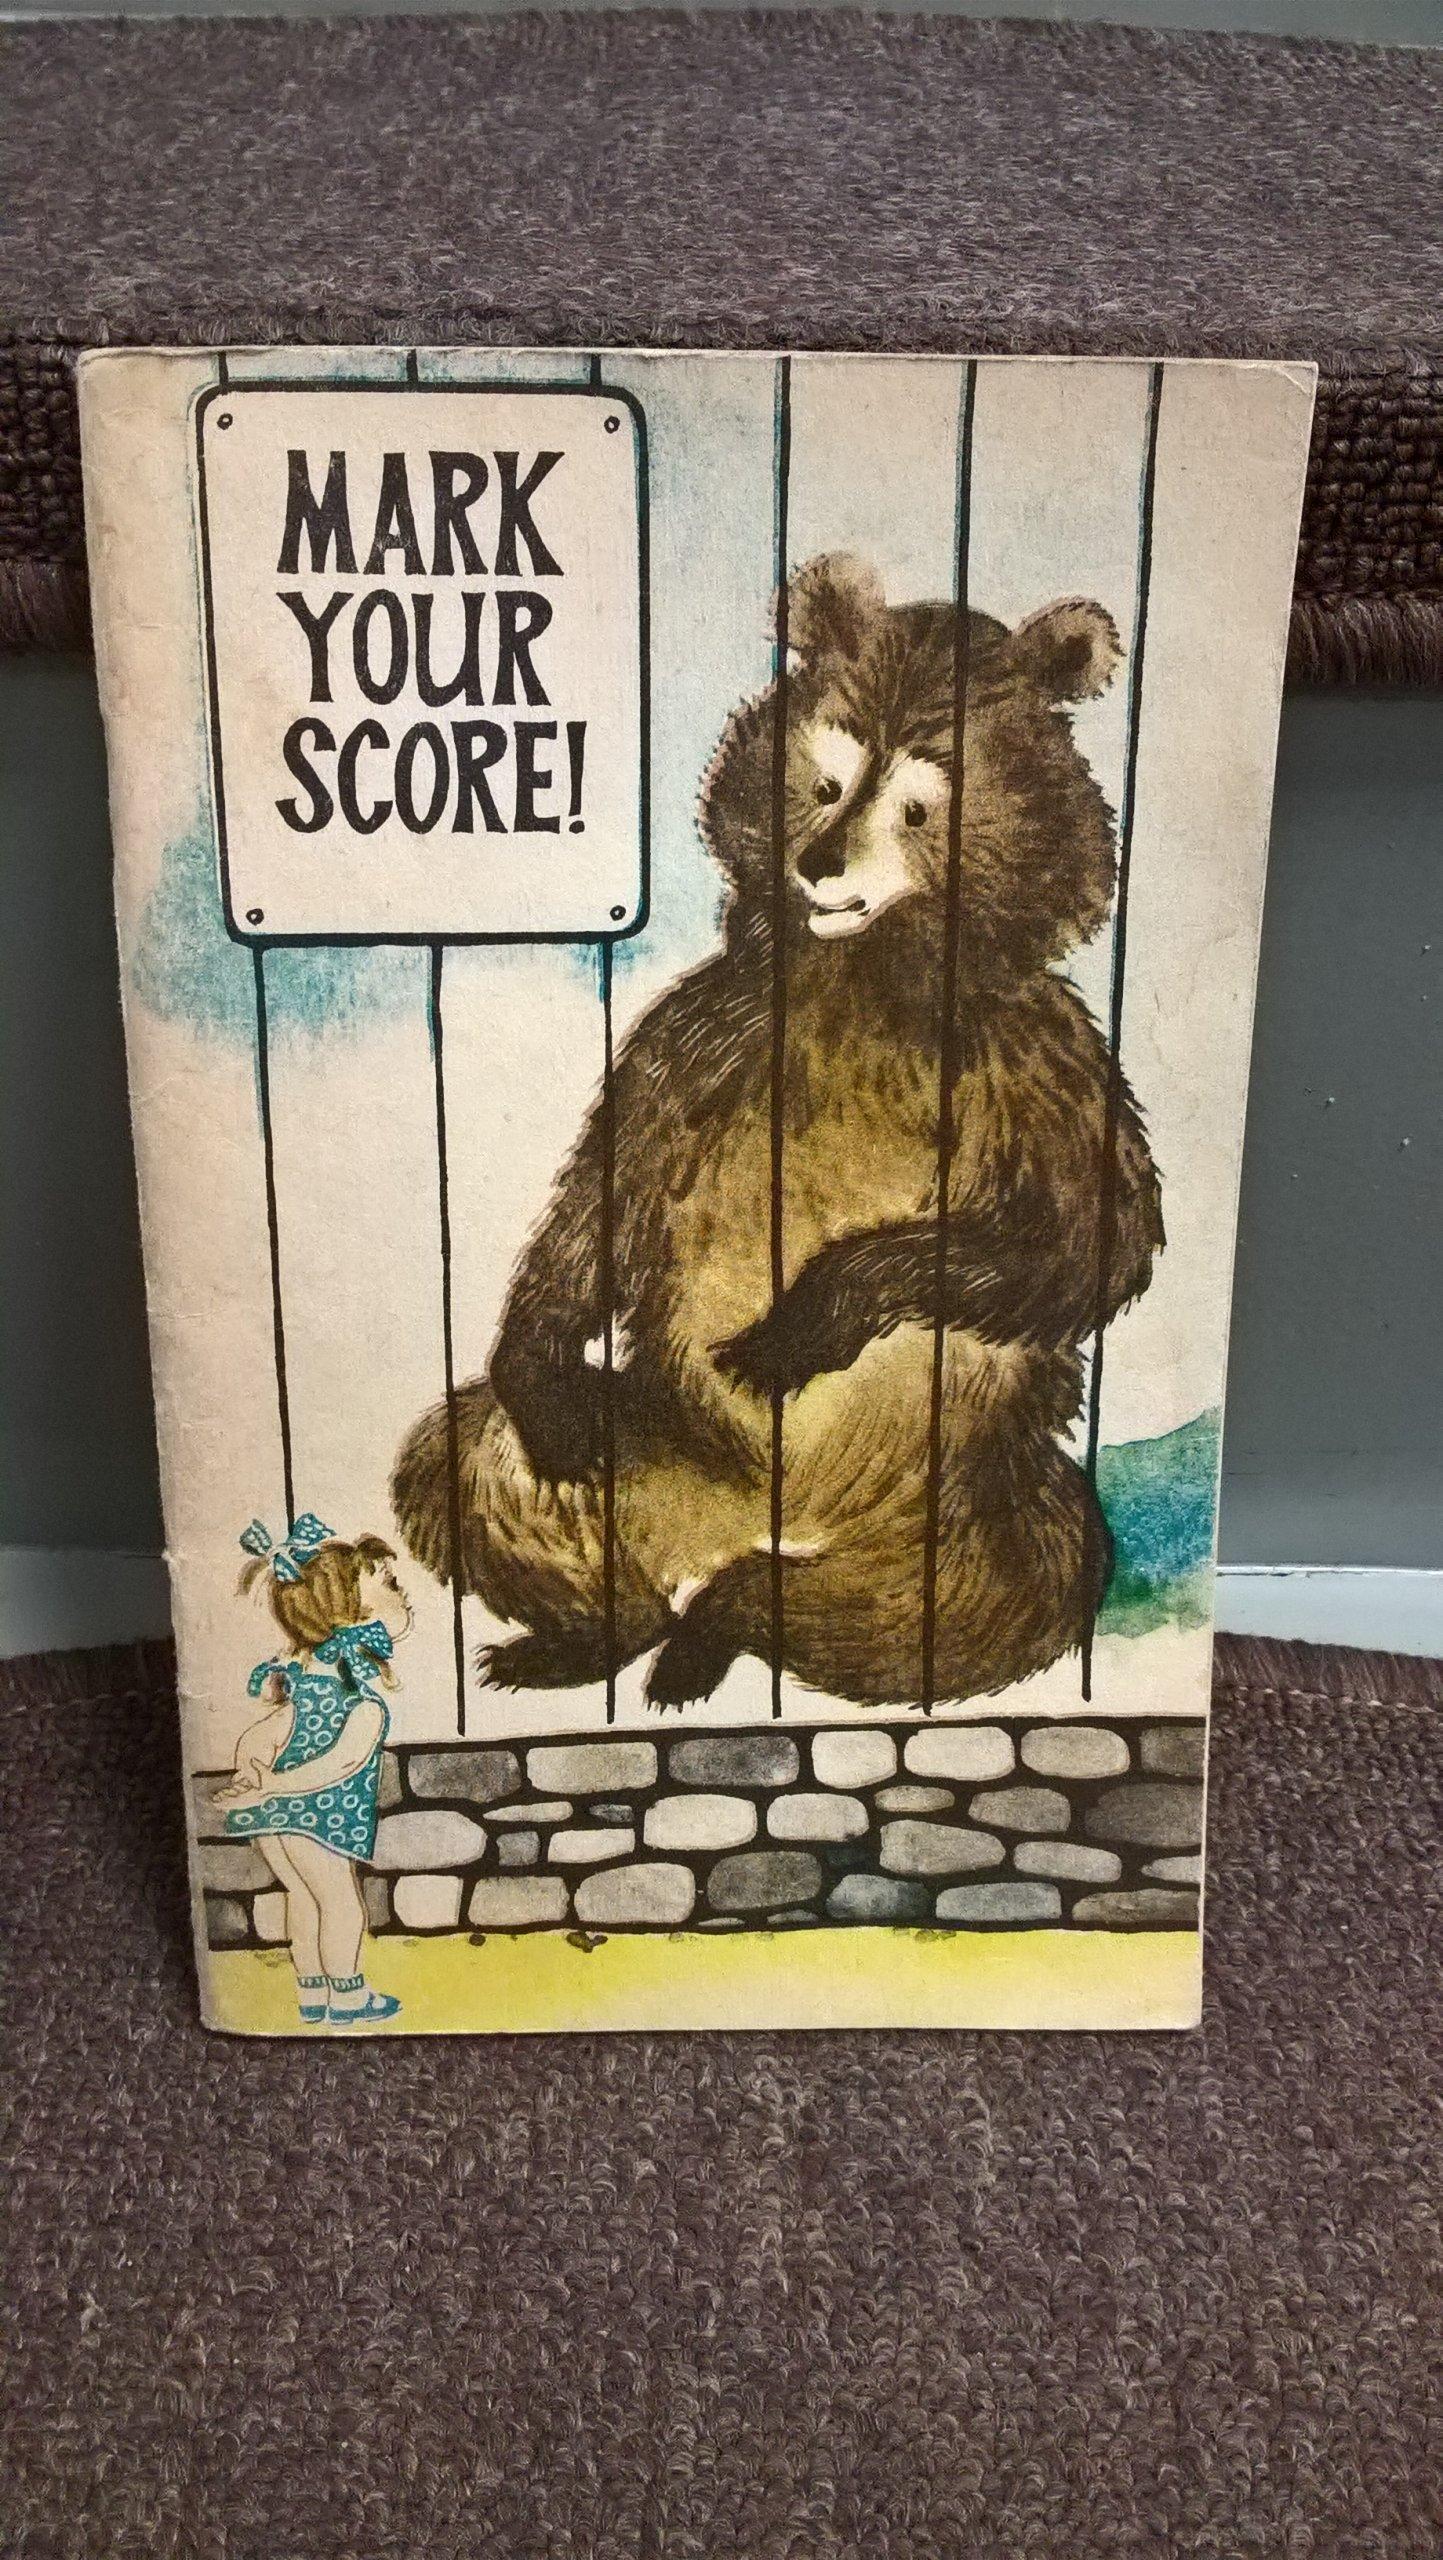 Mark your score